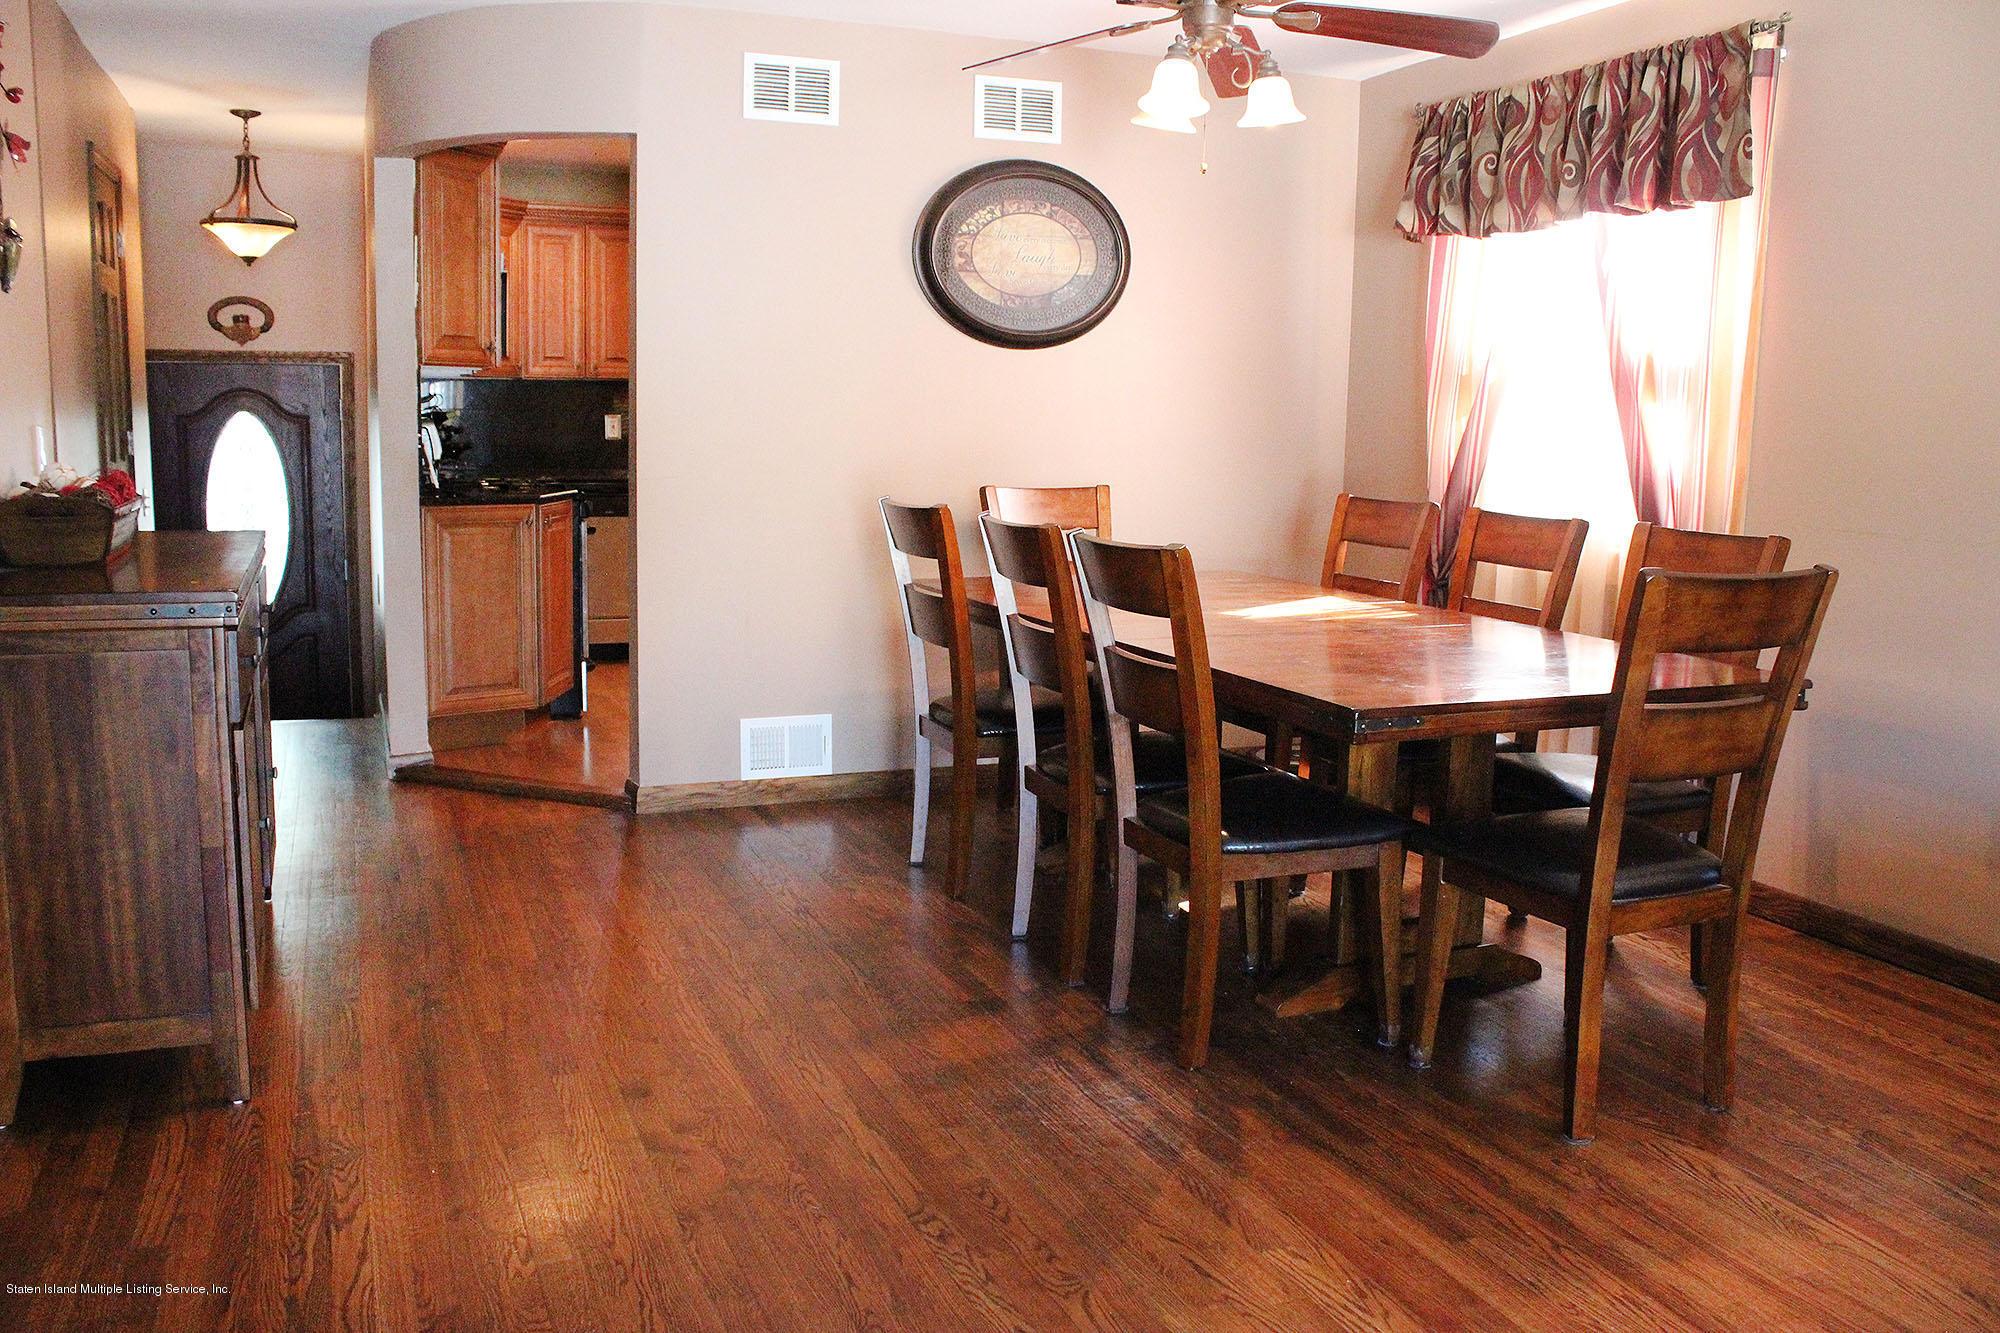 Single Family - Semi-Attached 97 Amber Street  Staten Island, NY 10306, MLS-1130203-3